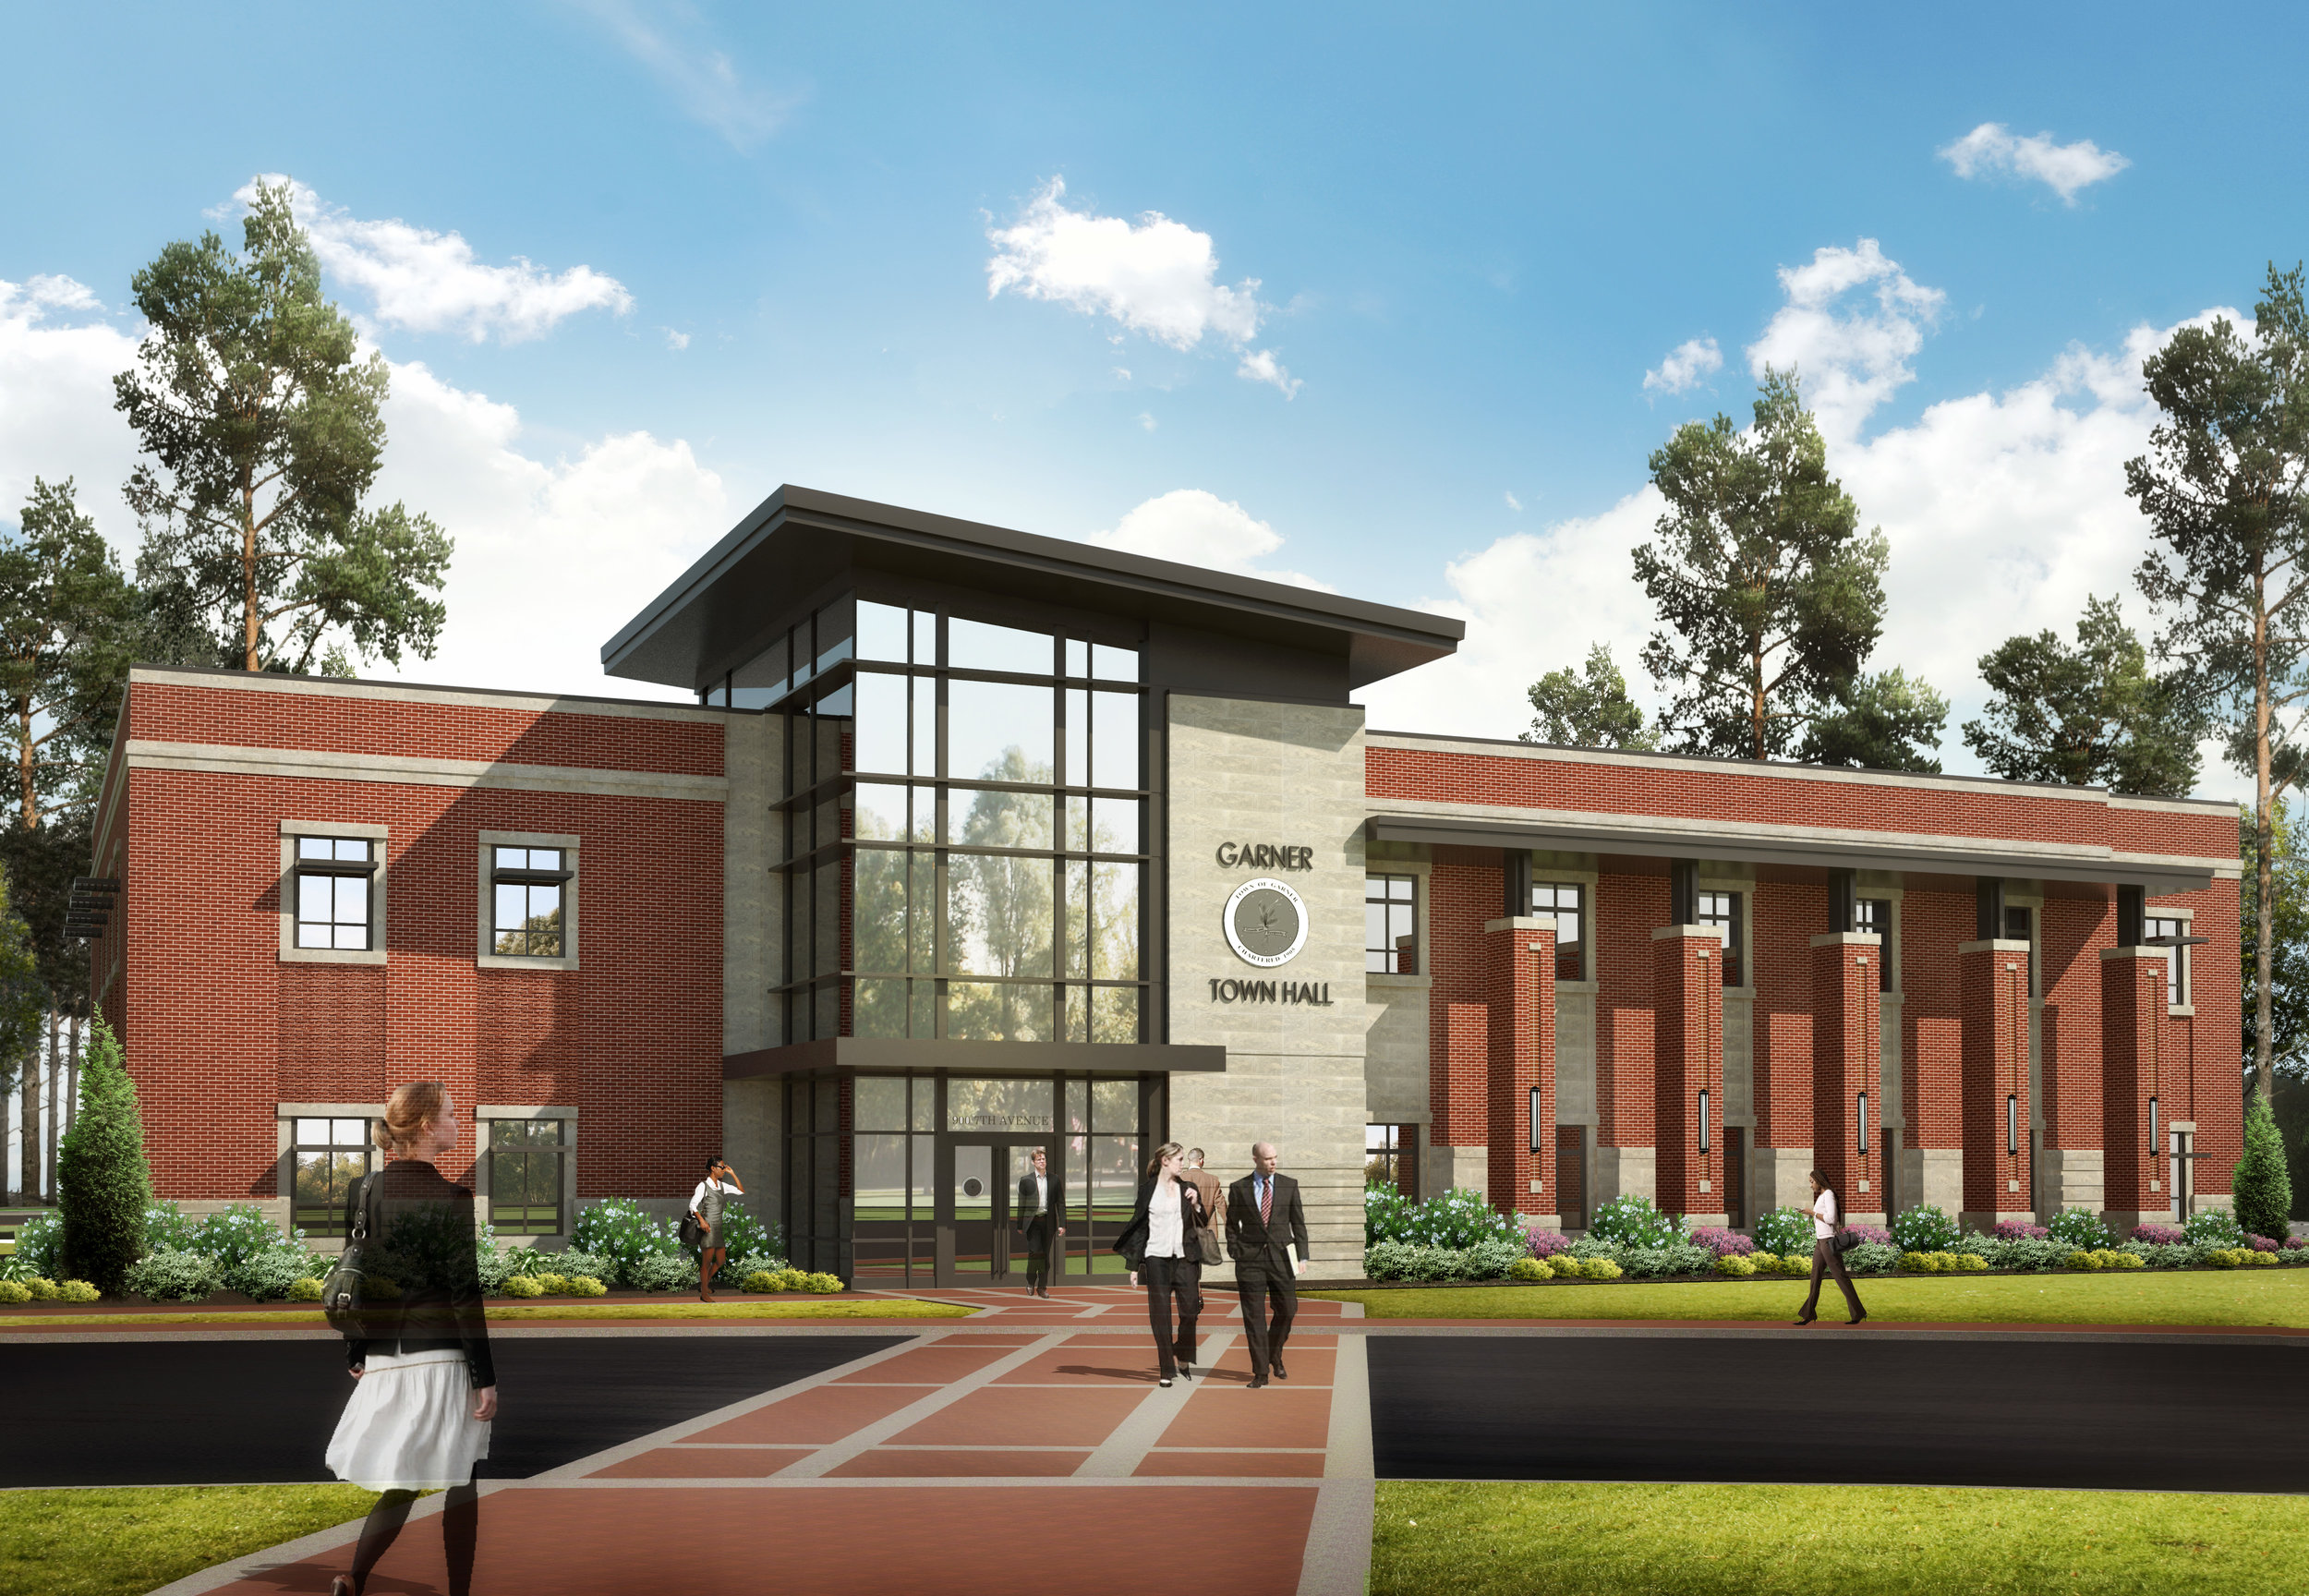 ADW-Civic-Town-Hall-Garner-NC-Exterior-Rendering.jpg